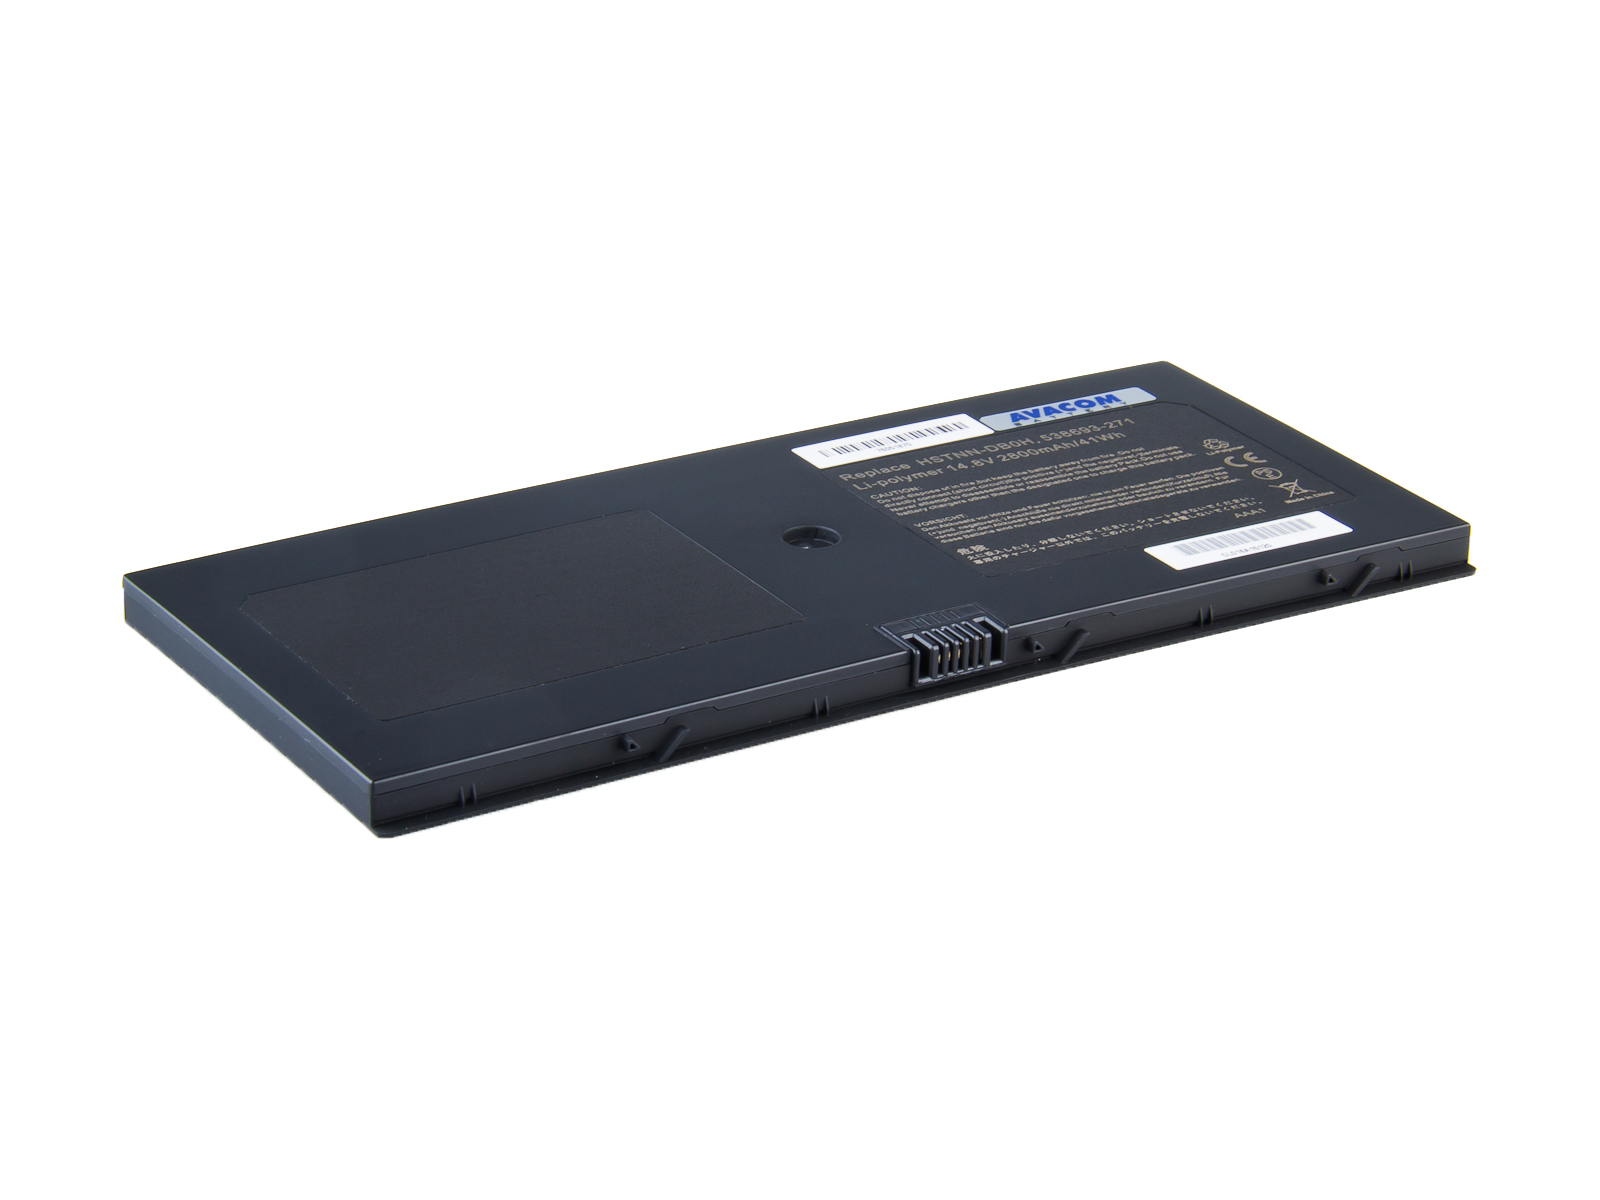 Baterie AVACOM NOHP-PB53-28P pro HP ProBook 5310m/5320m series Li-Pol 14,8V 2800mAh/41Wh